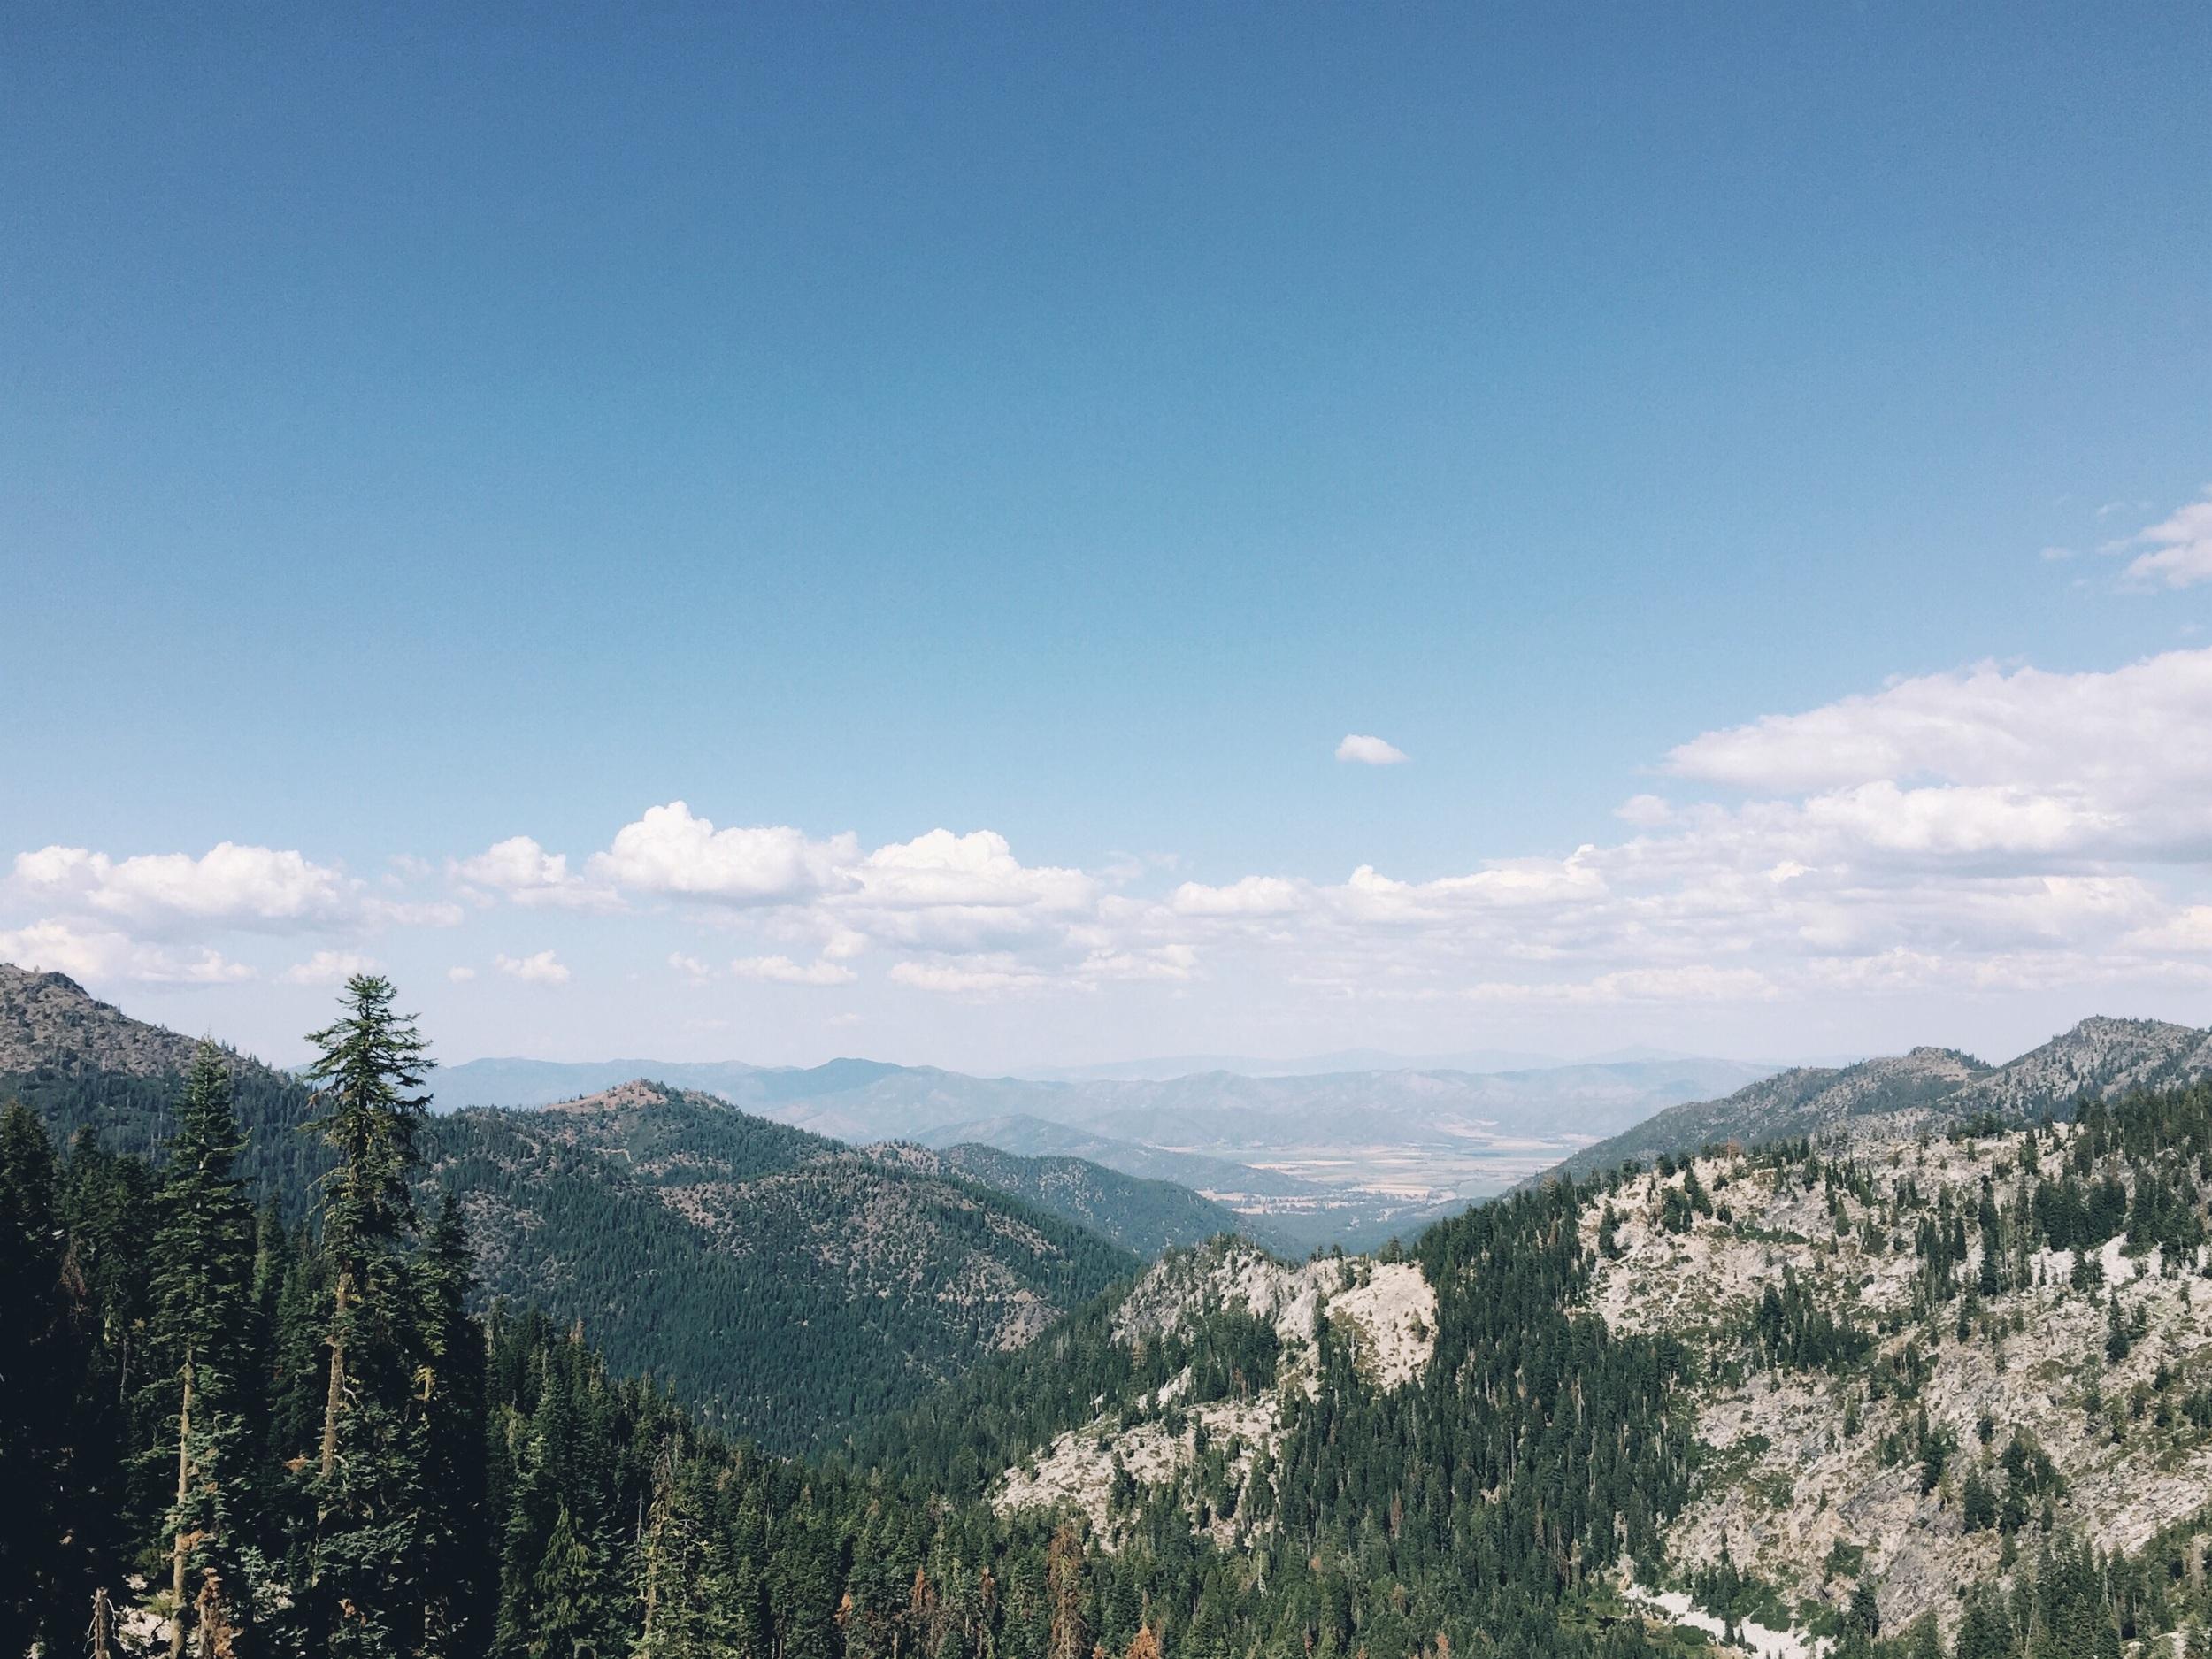 Some views.